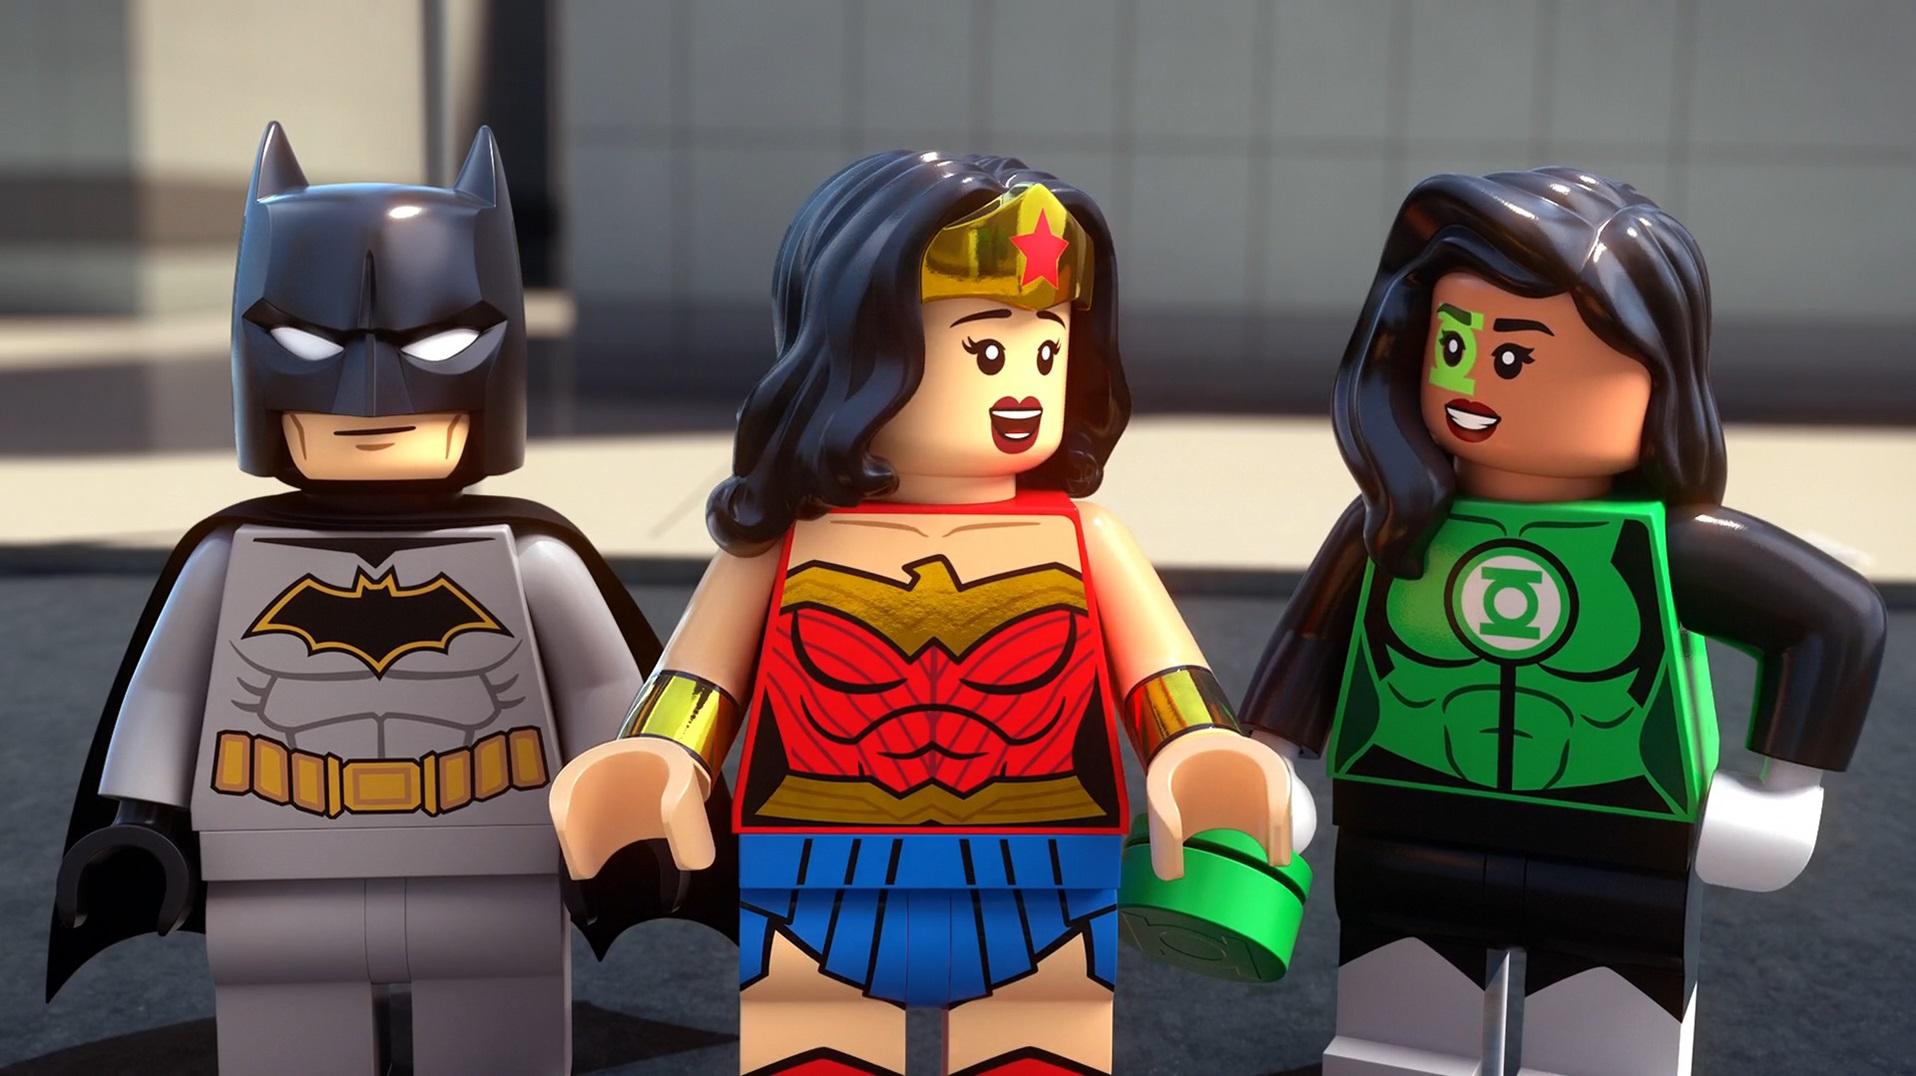 LEGO DC: Shazam - Sihir & Canavarlar | 2020 | WEB-DL | XviD | Türkçe Dublaj | m720p - m1080p | WEB-DL | Dual | TR-EN | Tek Link